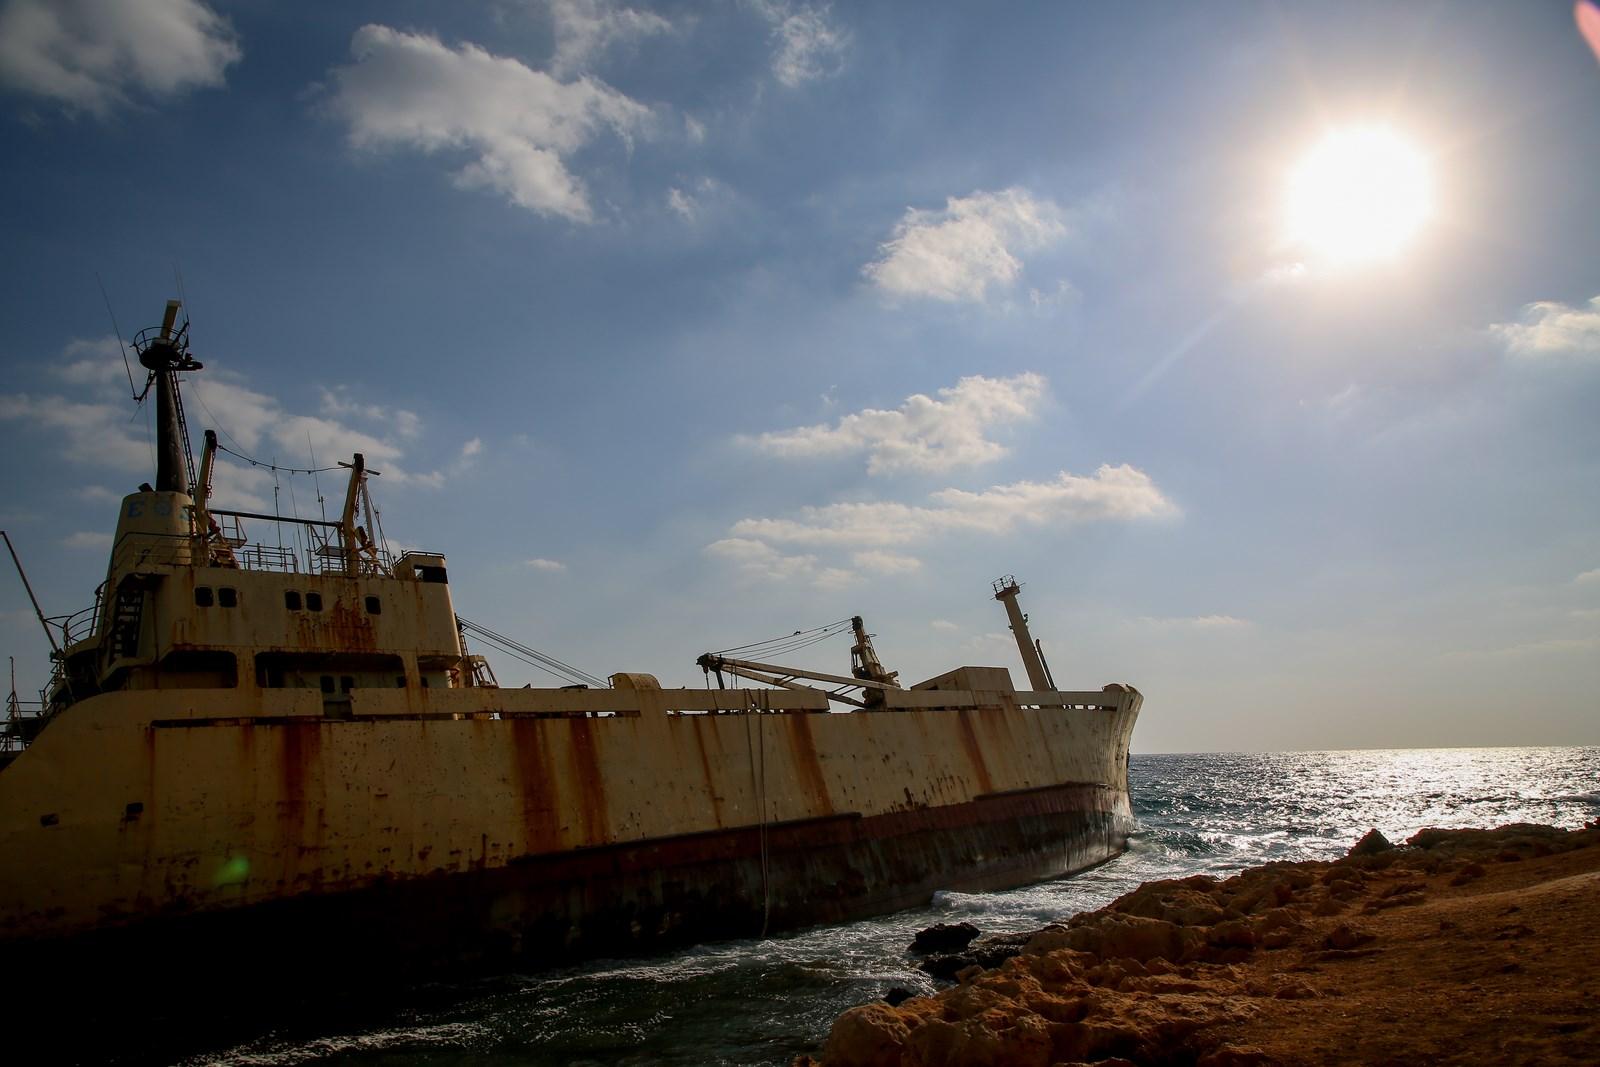 #EDRO III Shipwreck